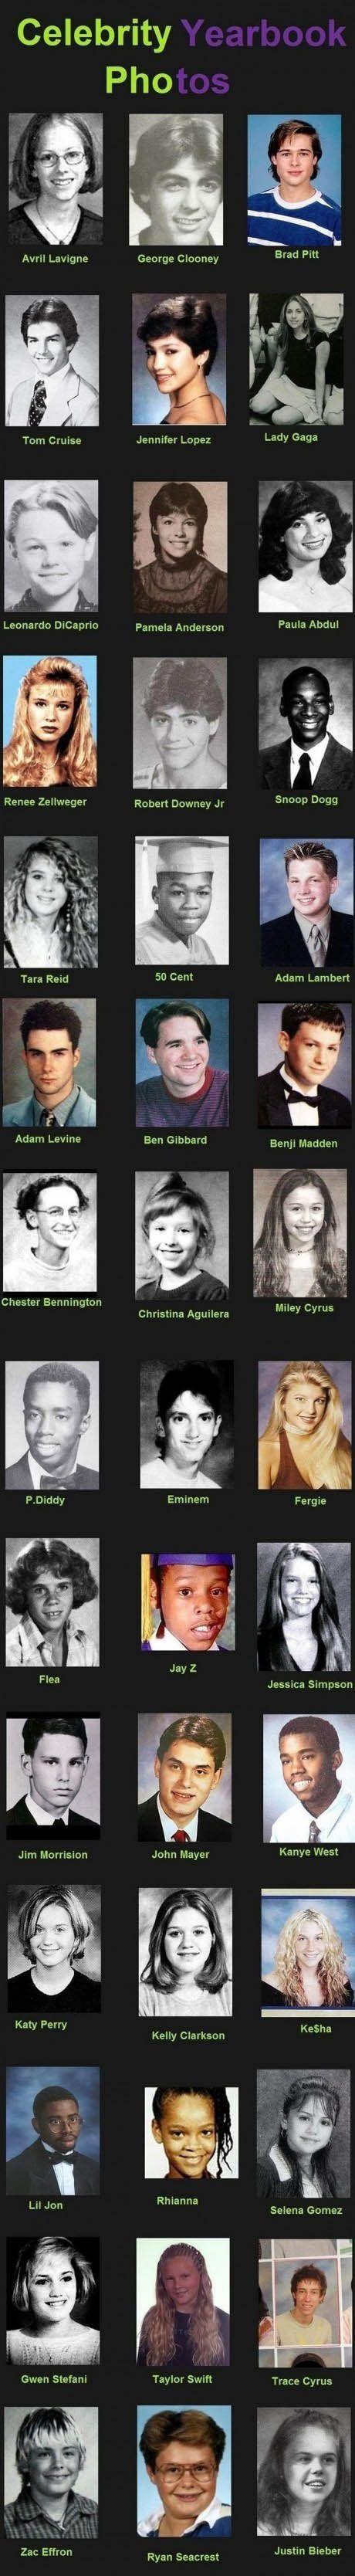 Celebrity yearbook photos.